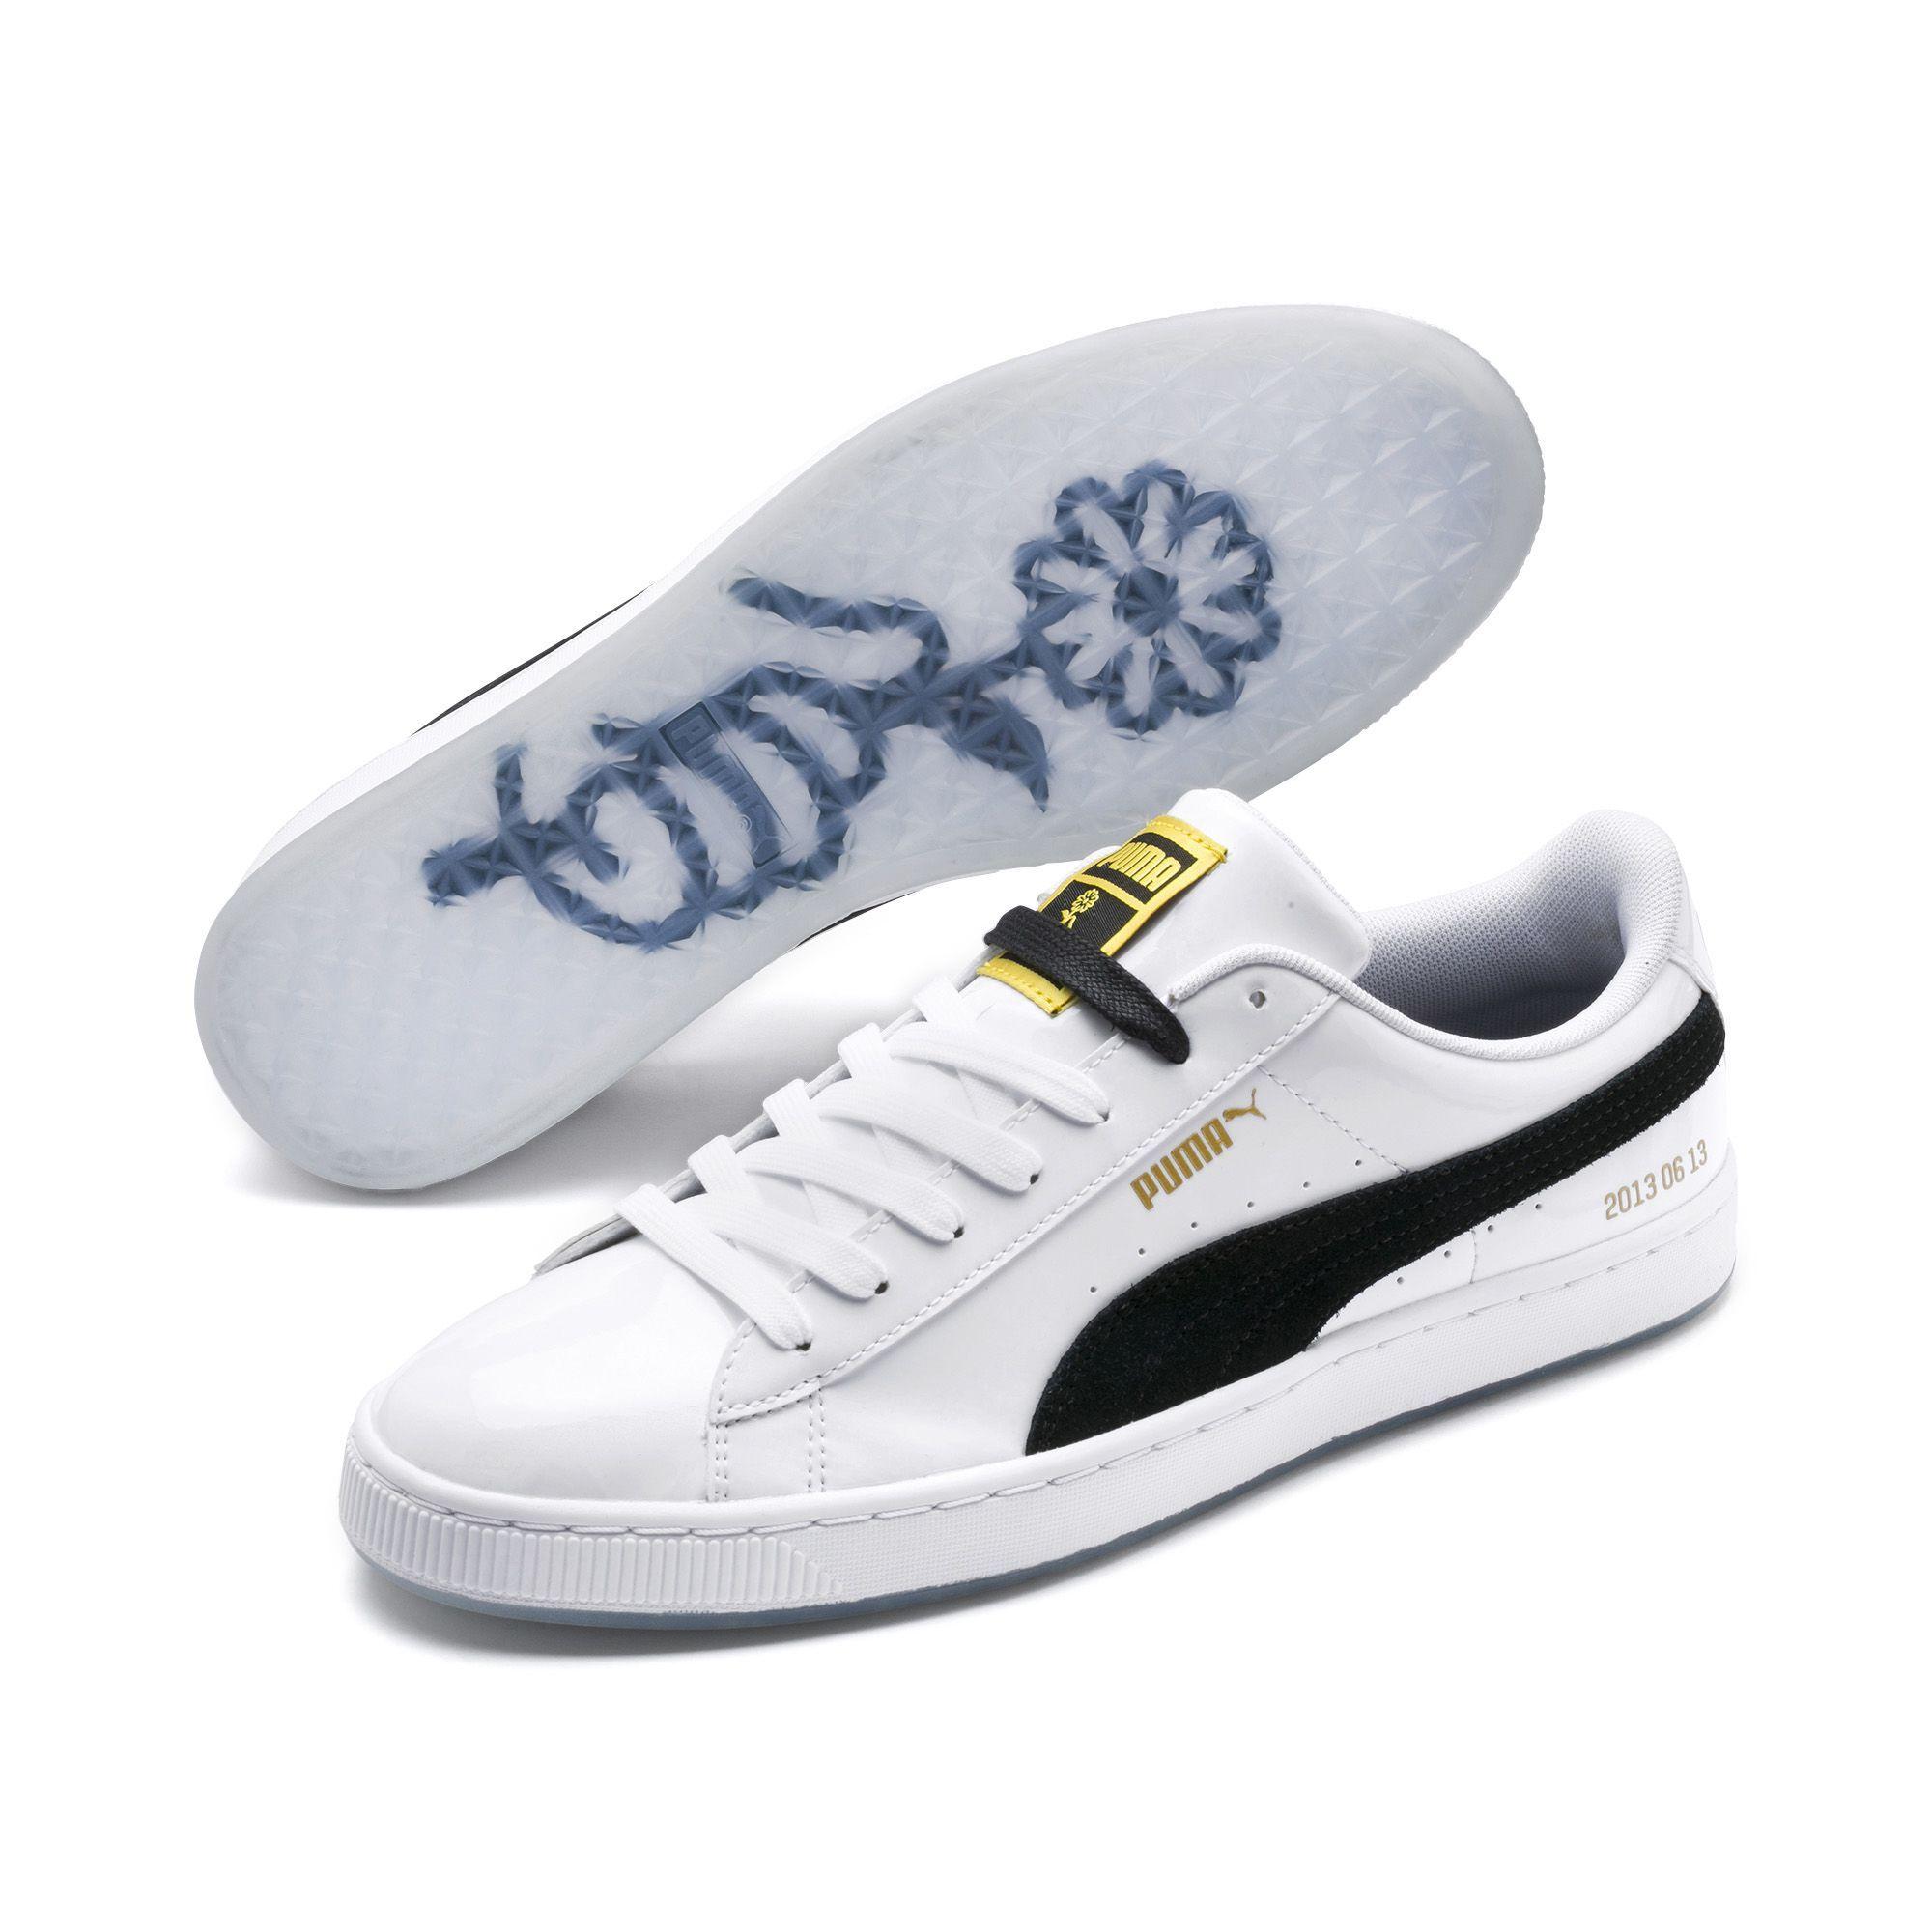 puma x bts shoes 2018